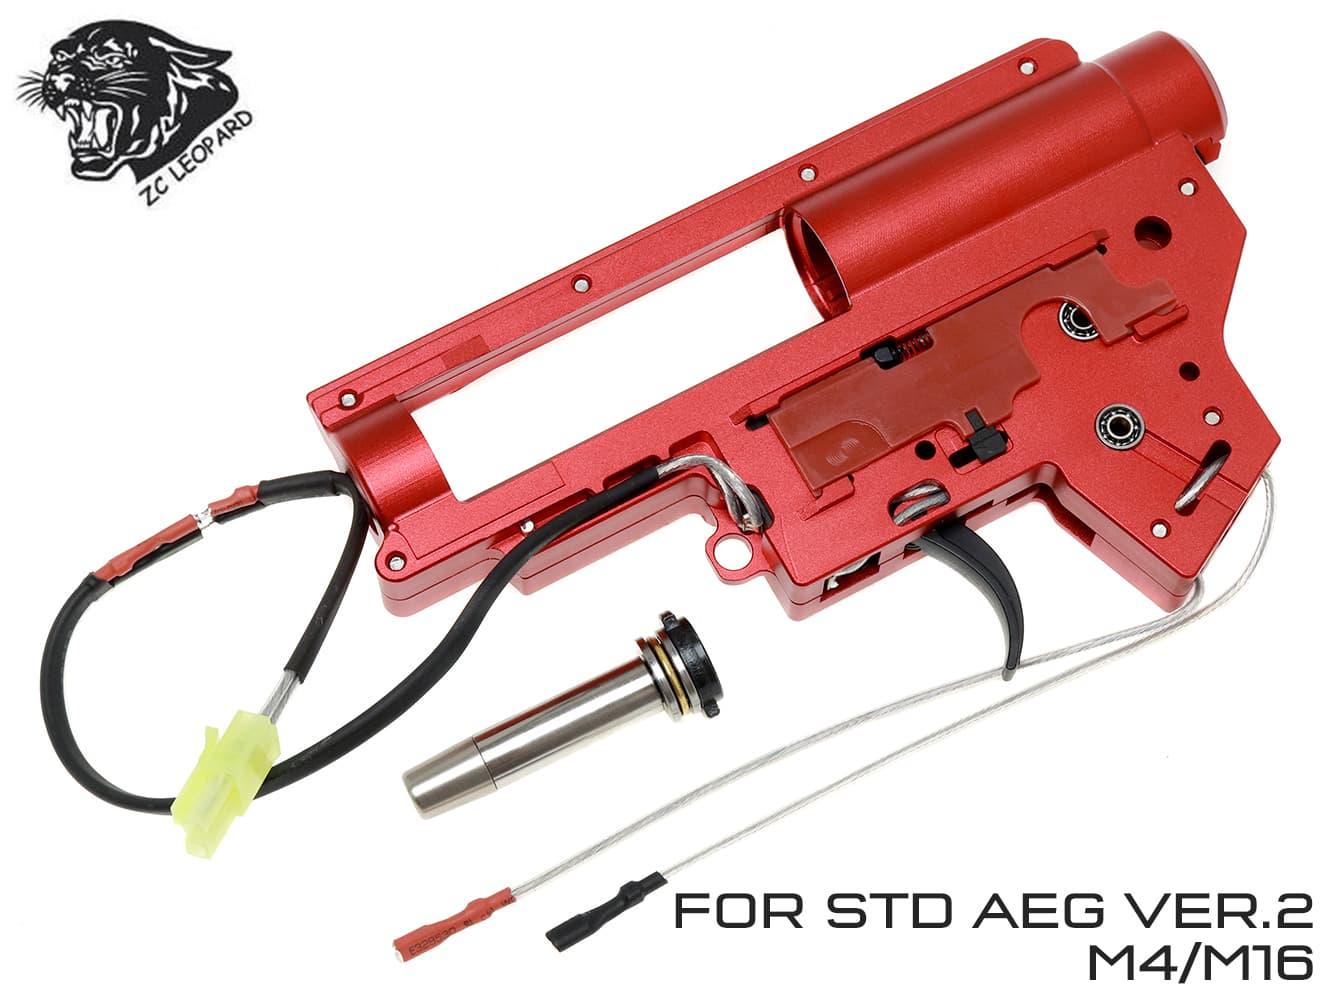 ZC LEOPARD V2 QD A7075 CNCメカボックスセット 前方配線 for AEG M4 ◆電動ガン系M4 軽量高強度 A7075CNC製 超々ジュラルミン 8mm軸受